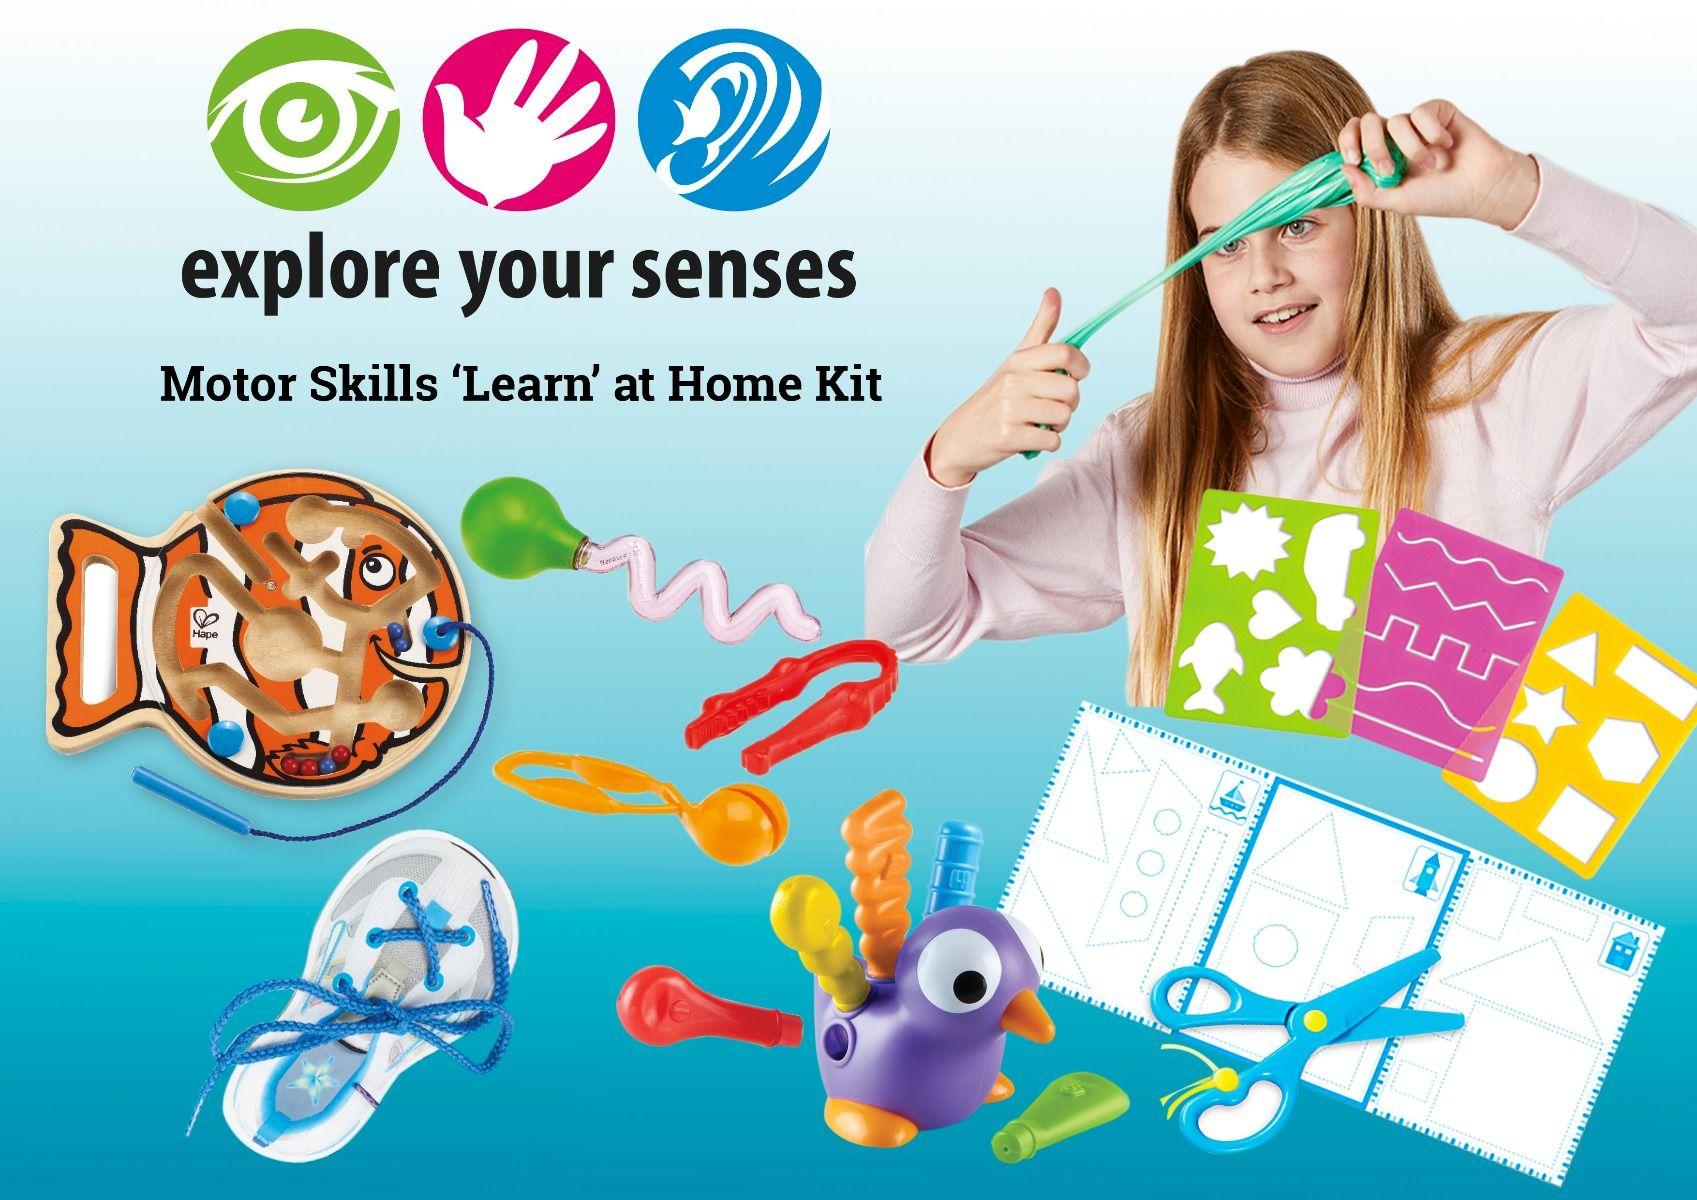 Motor Skills 'LEARN AT HOME' Kit